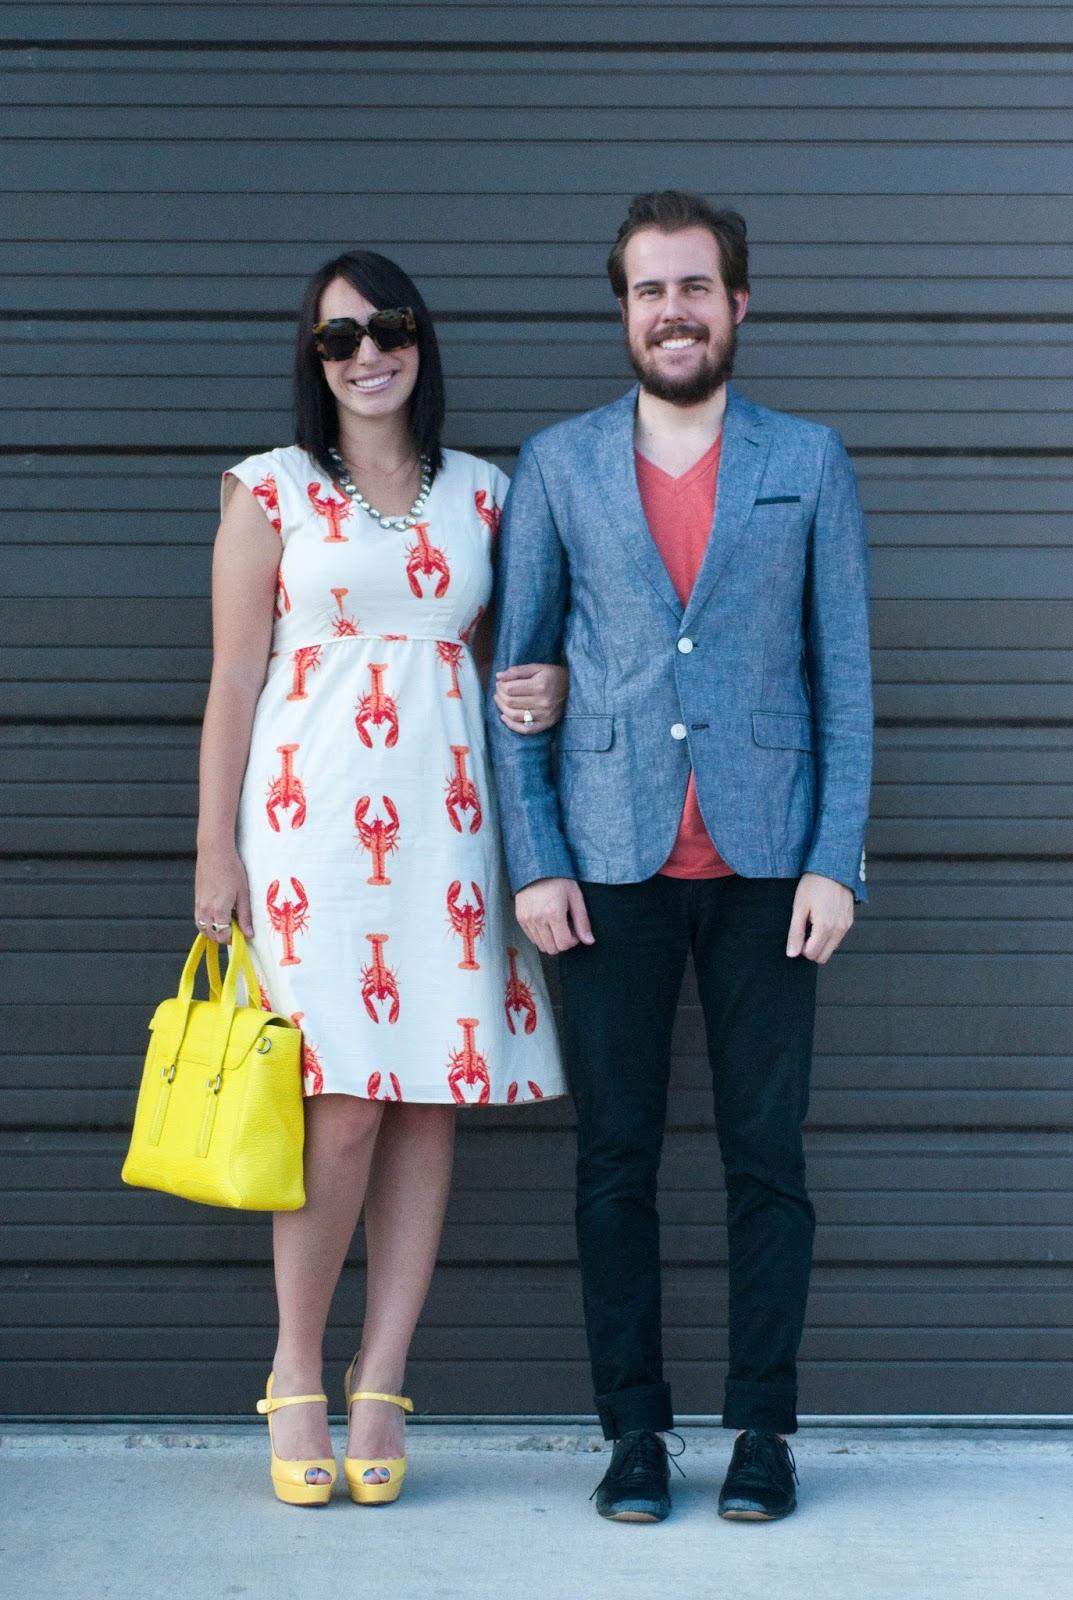 ootd, style blog, couples style blog, lobster dress, christian louboutin bana heels, 3.1 phillip lim pashli medium satchel, jcrew necklace